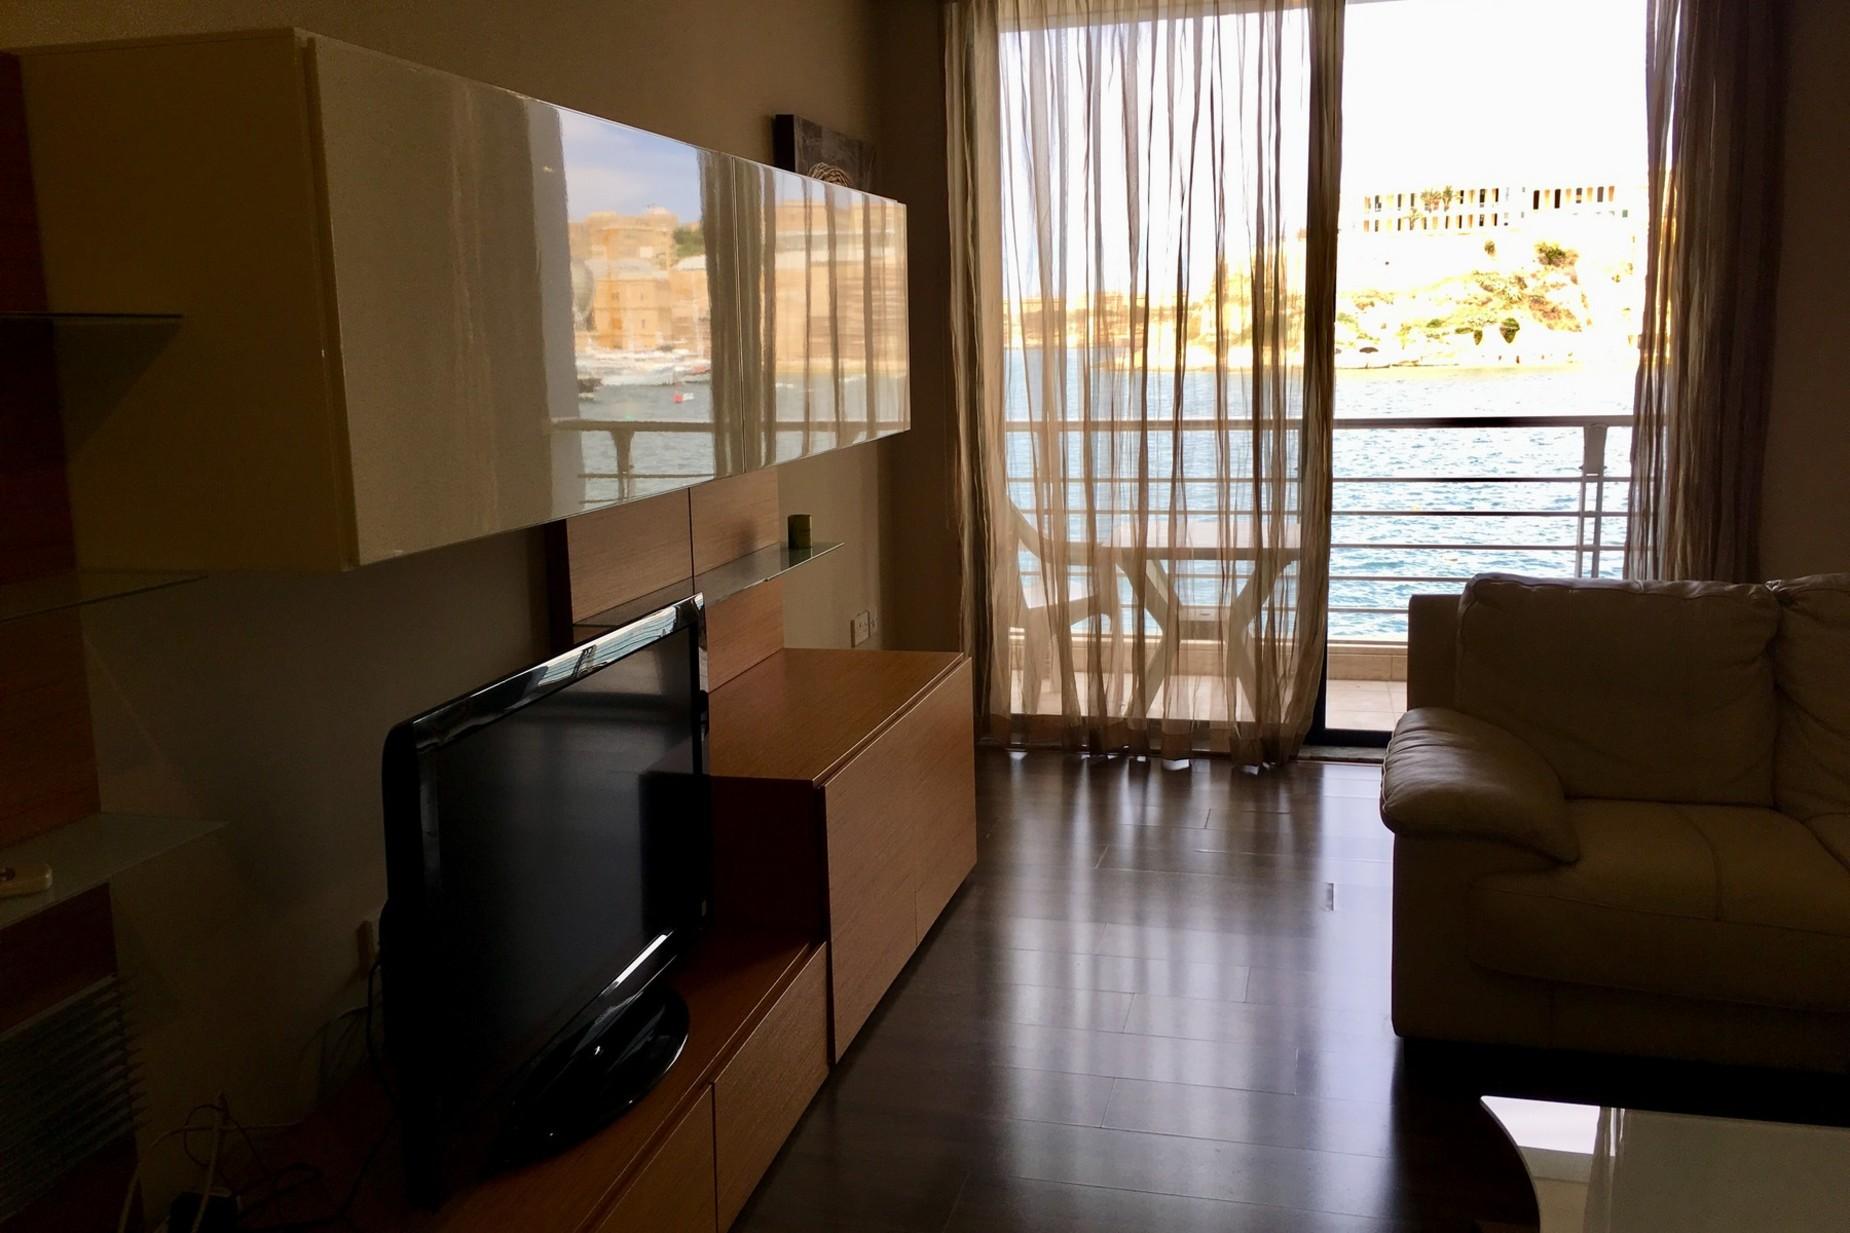 3 bed Apartment For Sale in Vittoriosa, Vittoriosa - thumb 3